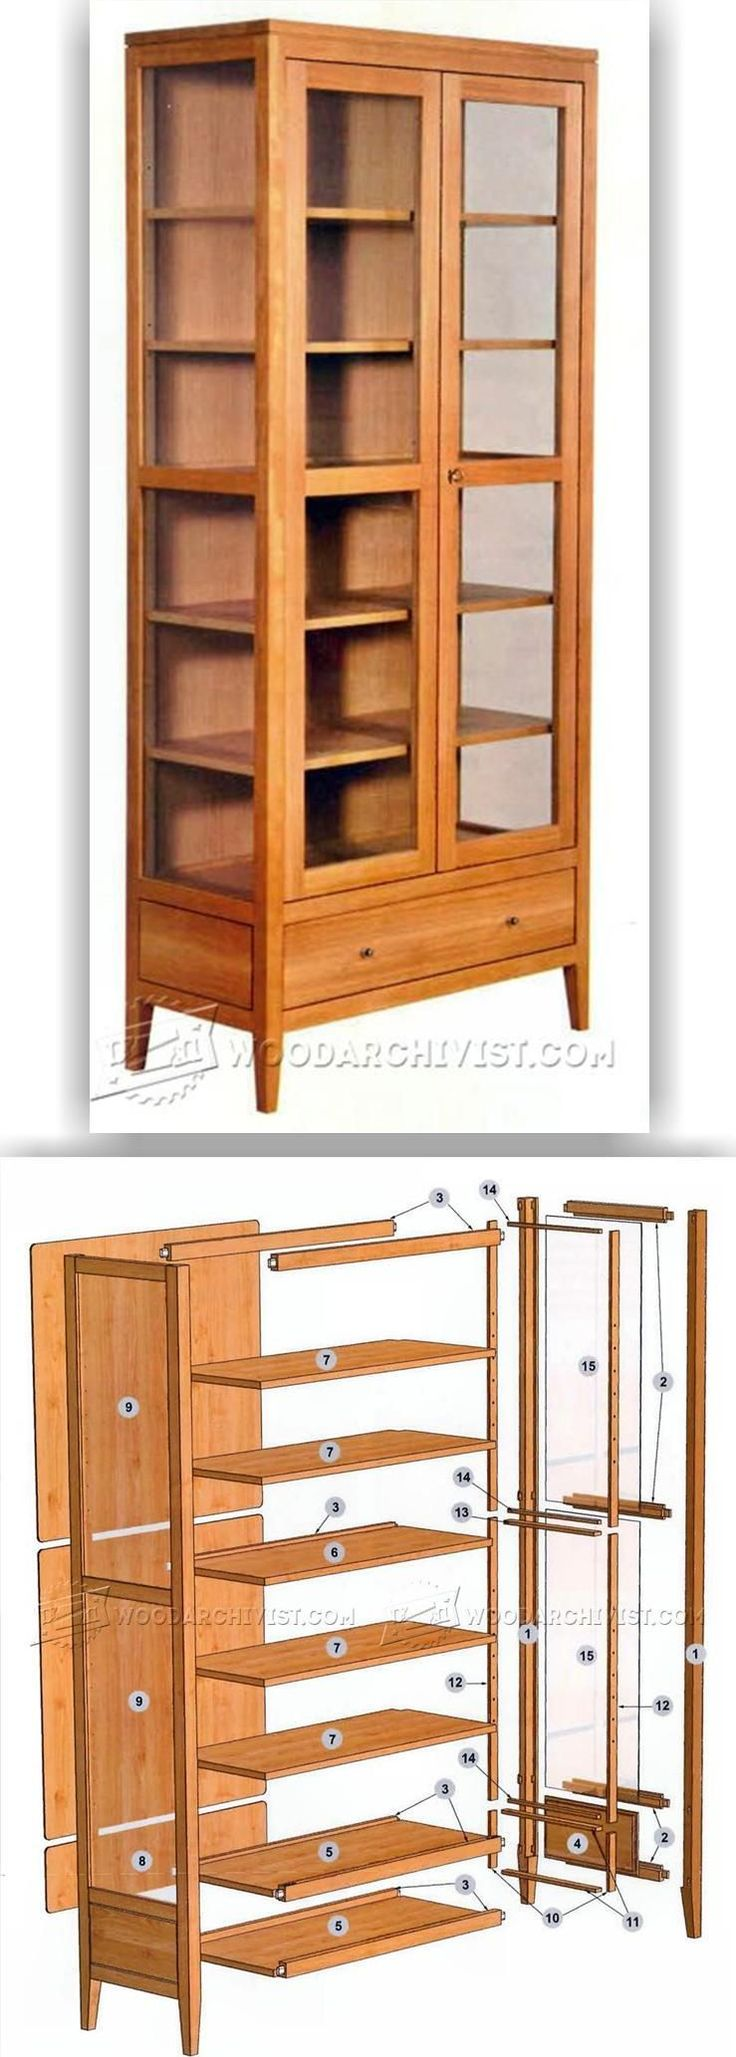 Showcase Cabinet Plans - Furniture Plans and Projects | WoodArchivist.com